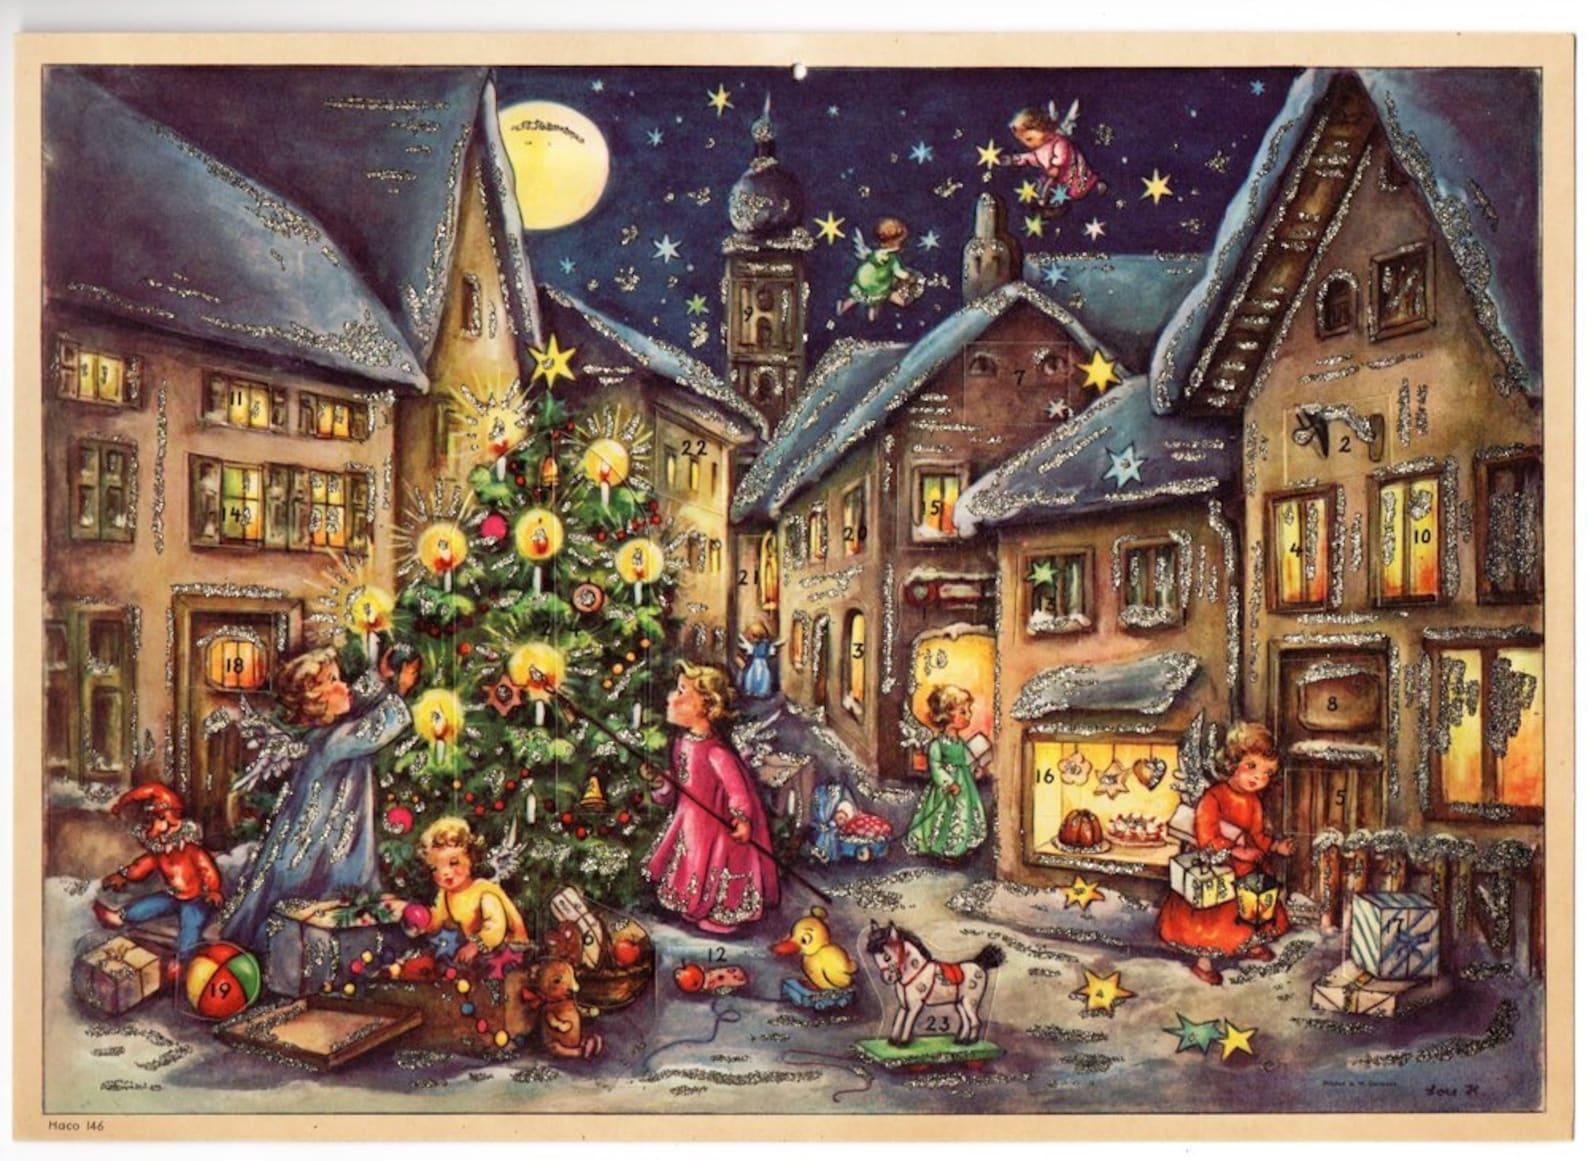 Vintage UNUSED German ADVENT CALENDAR Angels Christmas Tree Count Down Calendar, Mid Century German Christmas Decorations, 1950s Christmas